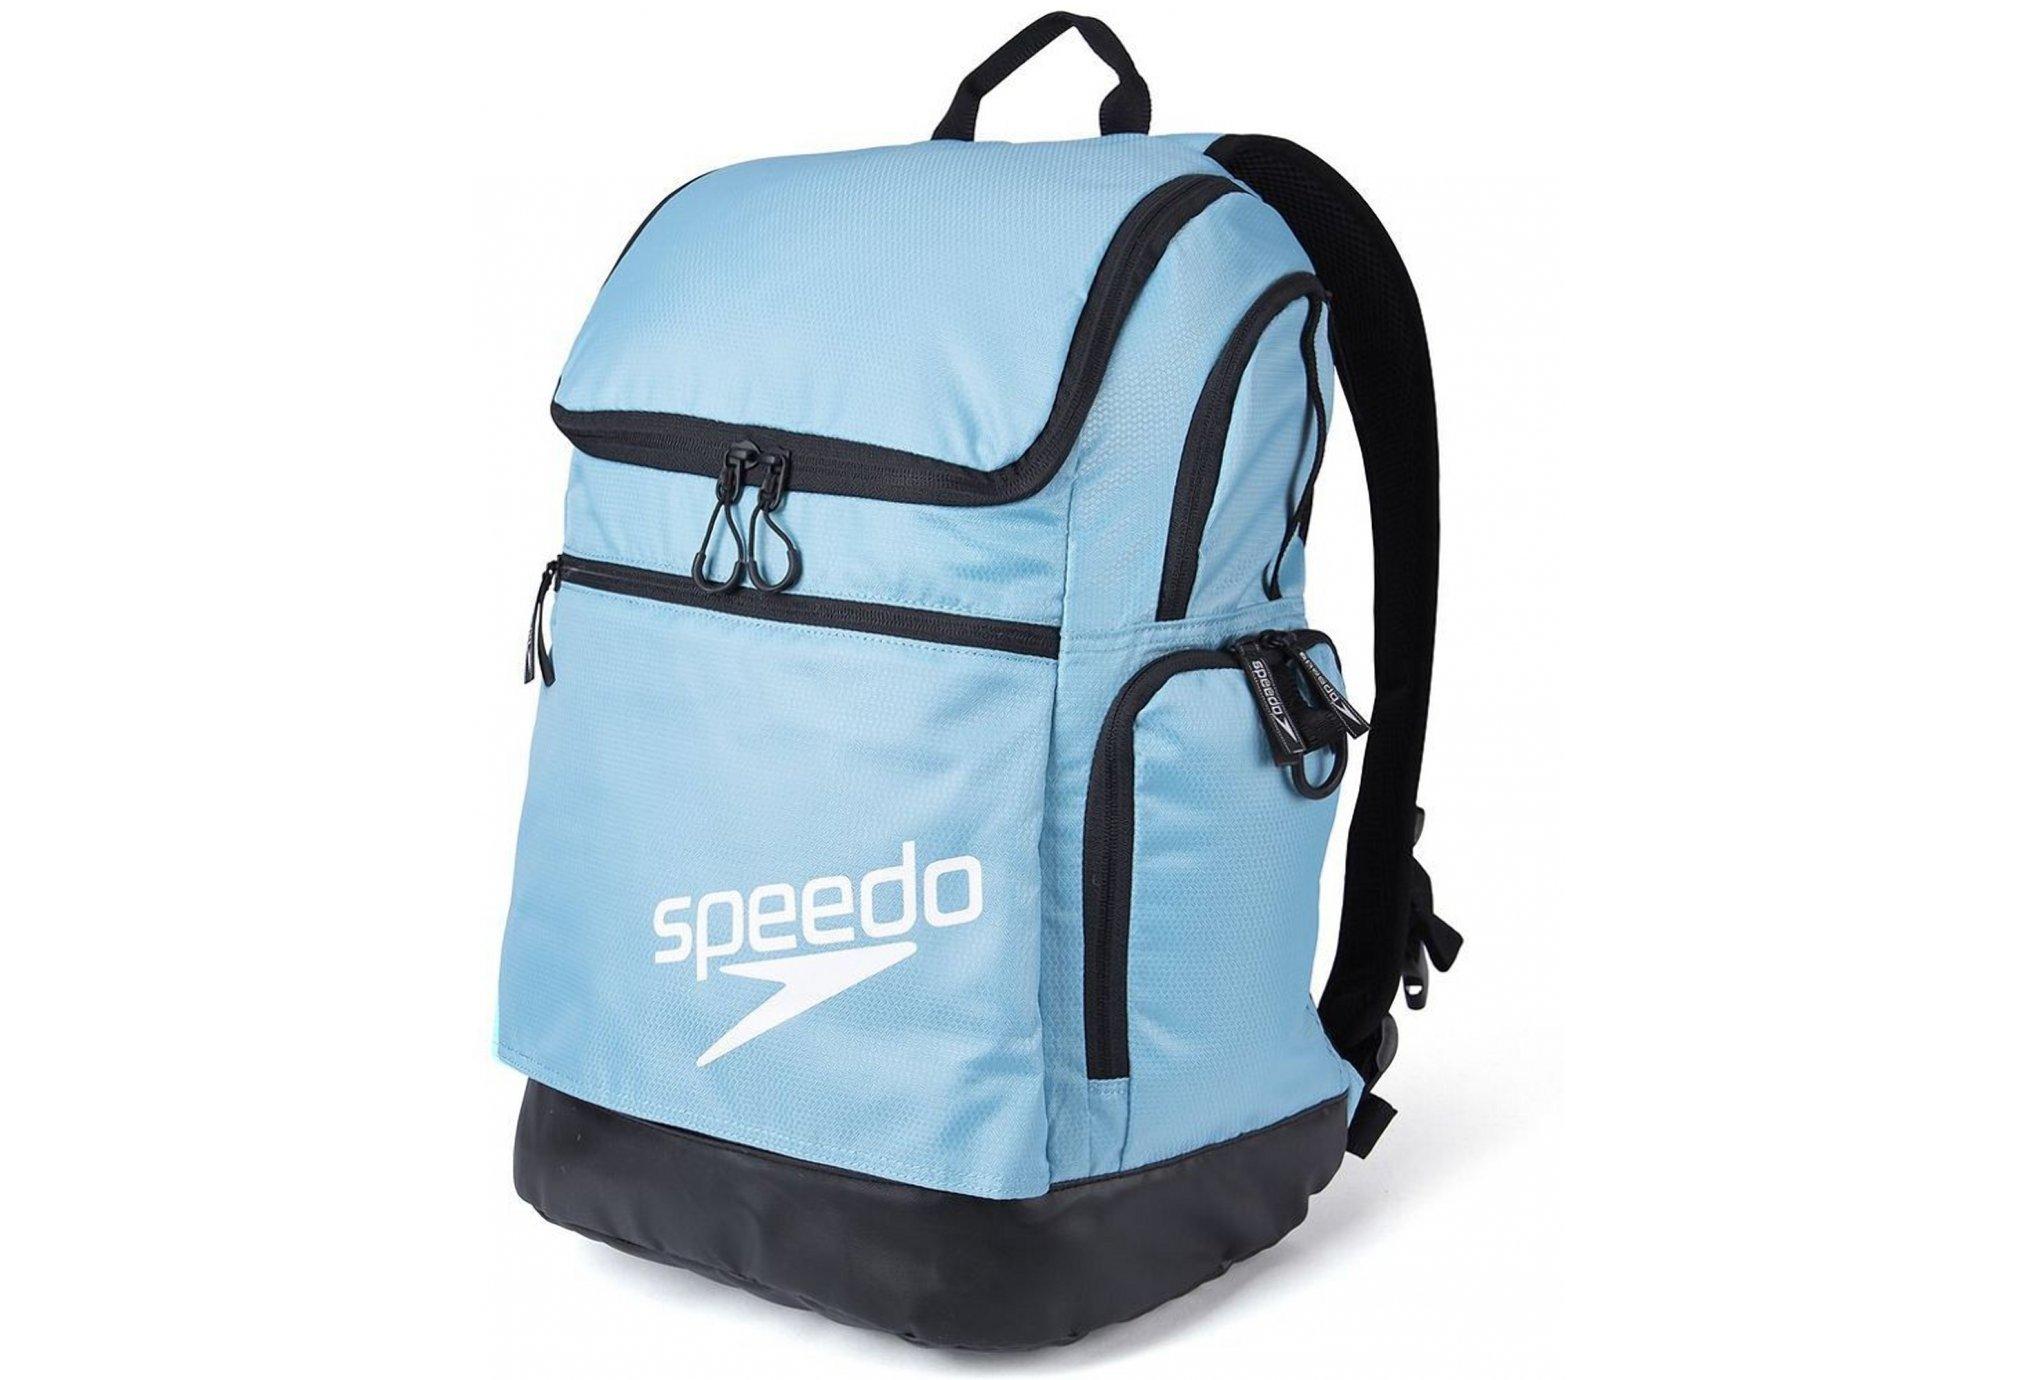 Speedo Teamster Rucksack 2.0 35L Sac à dos